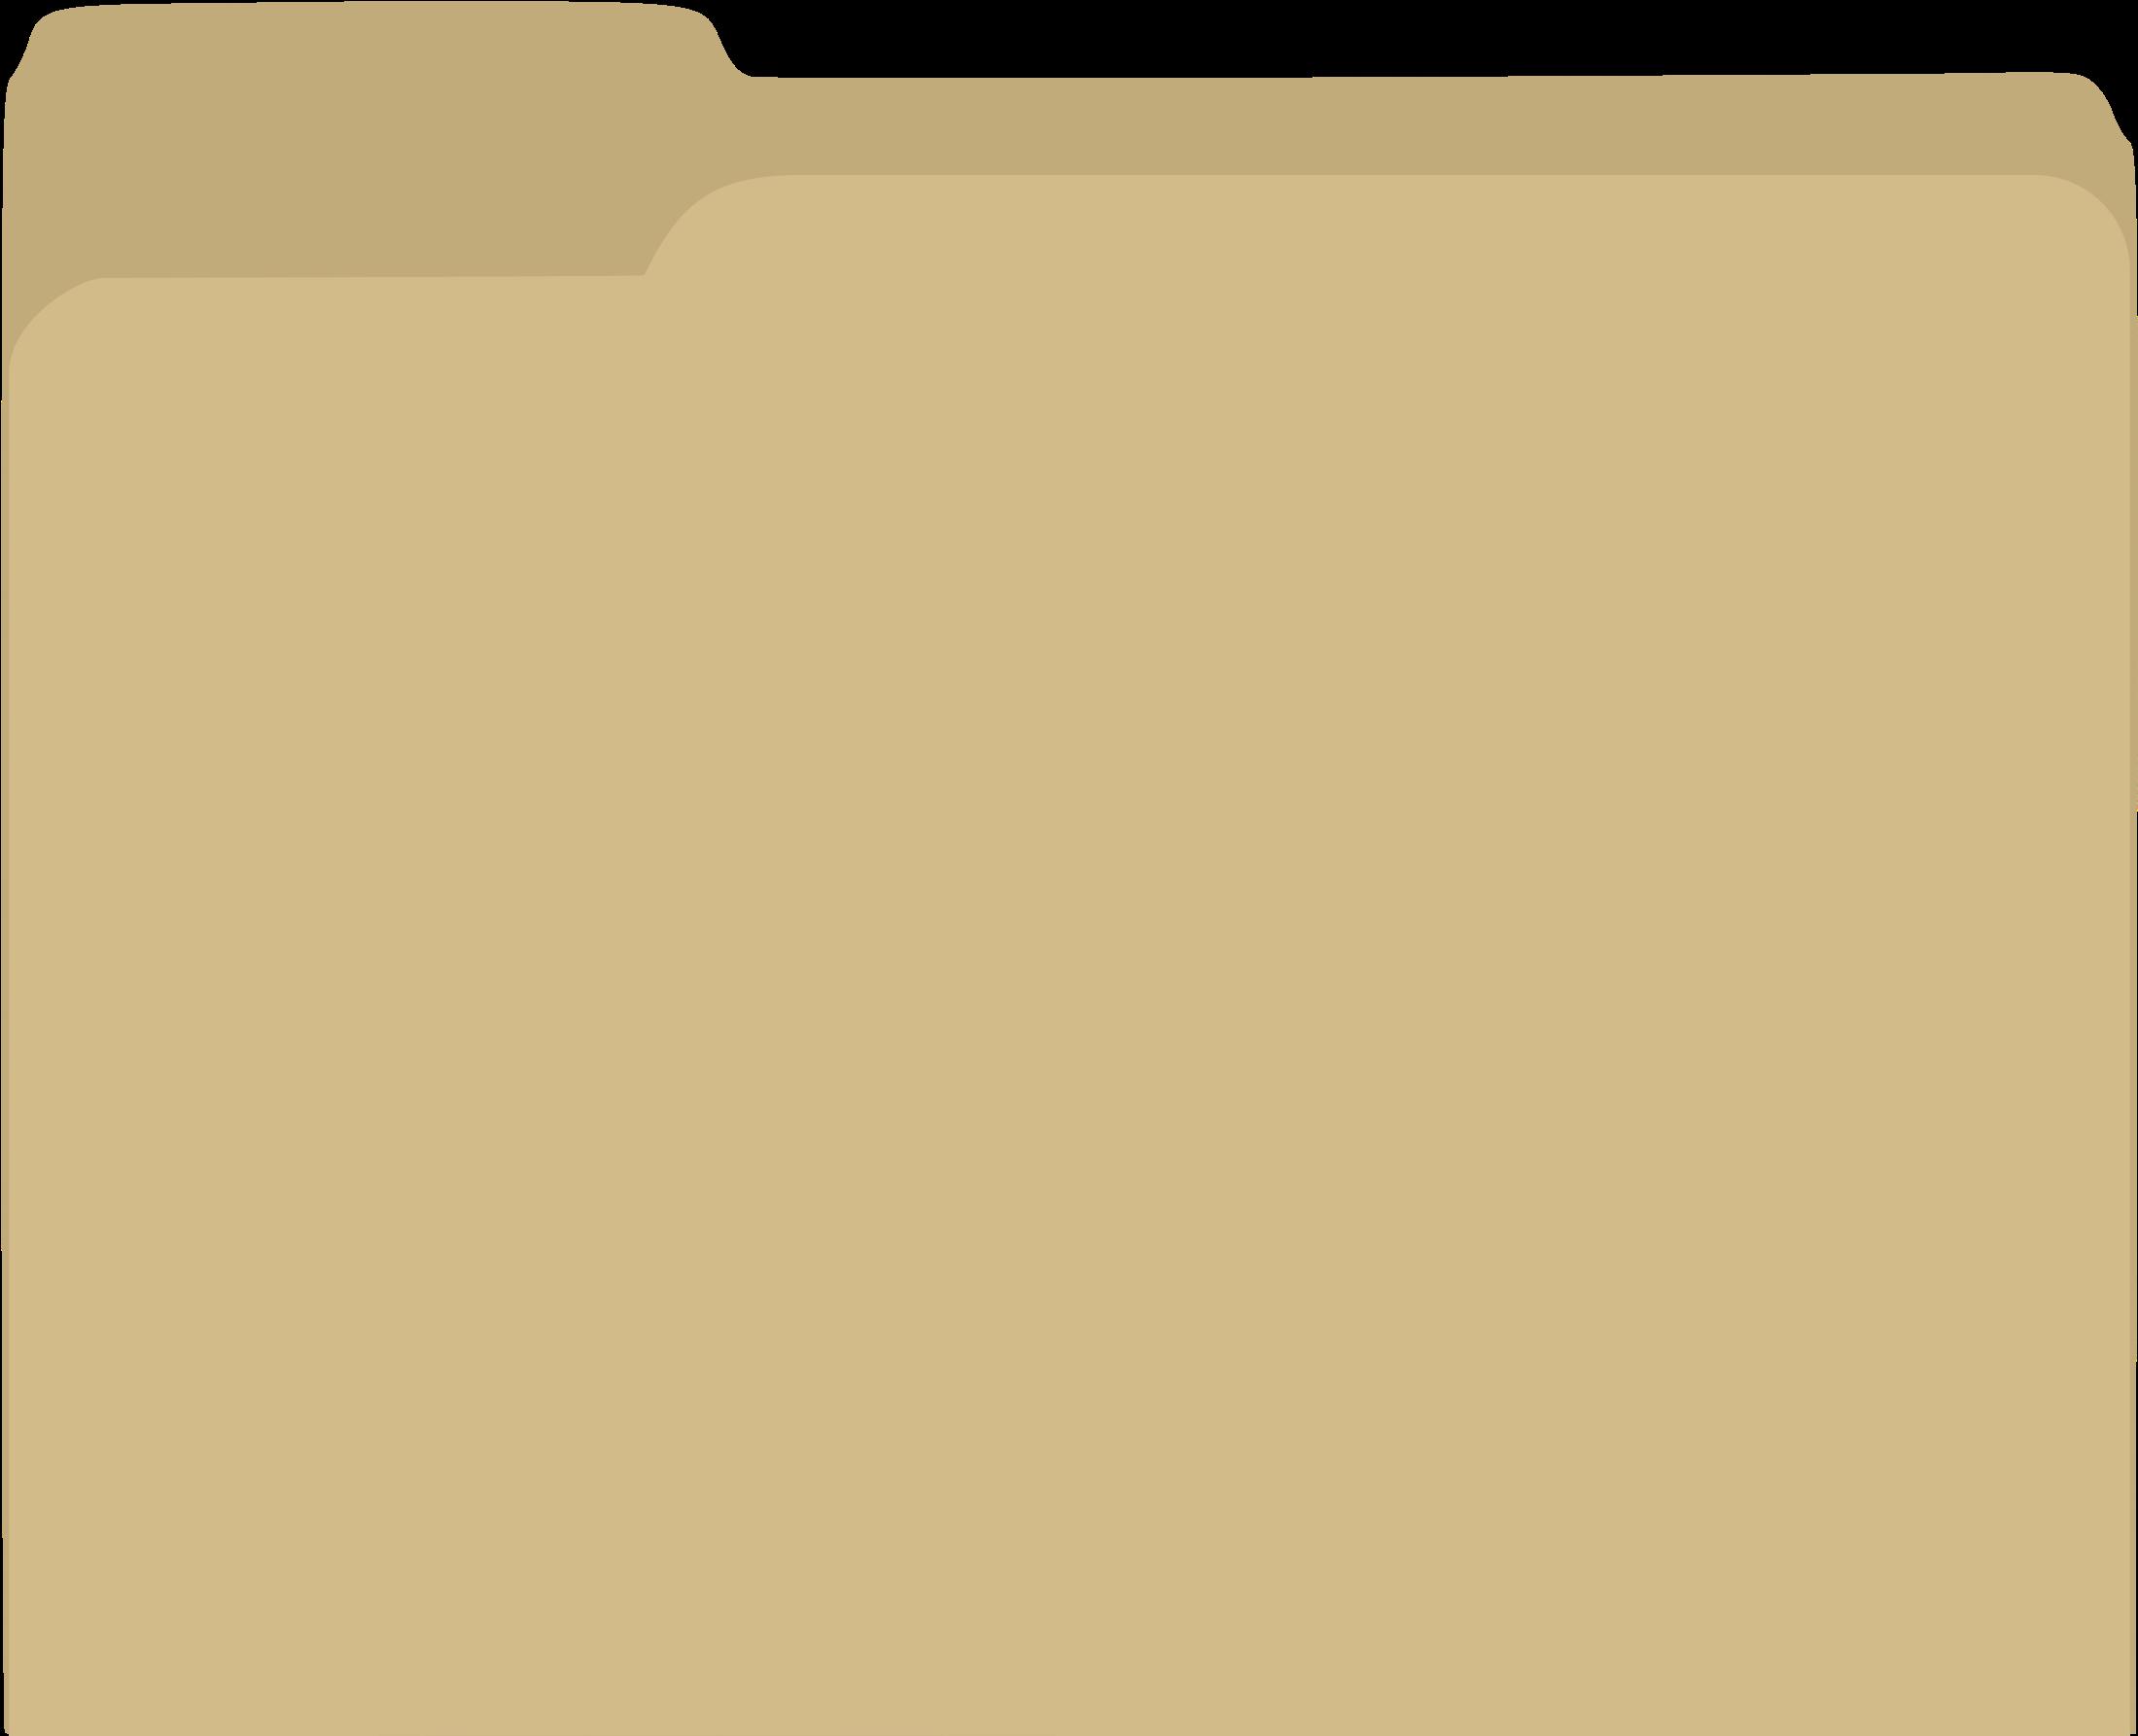 Hd manilla icons png. Folder clipart folder manila